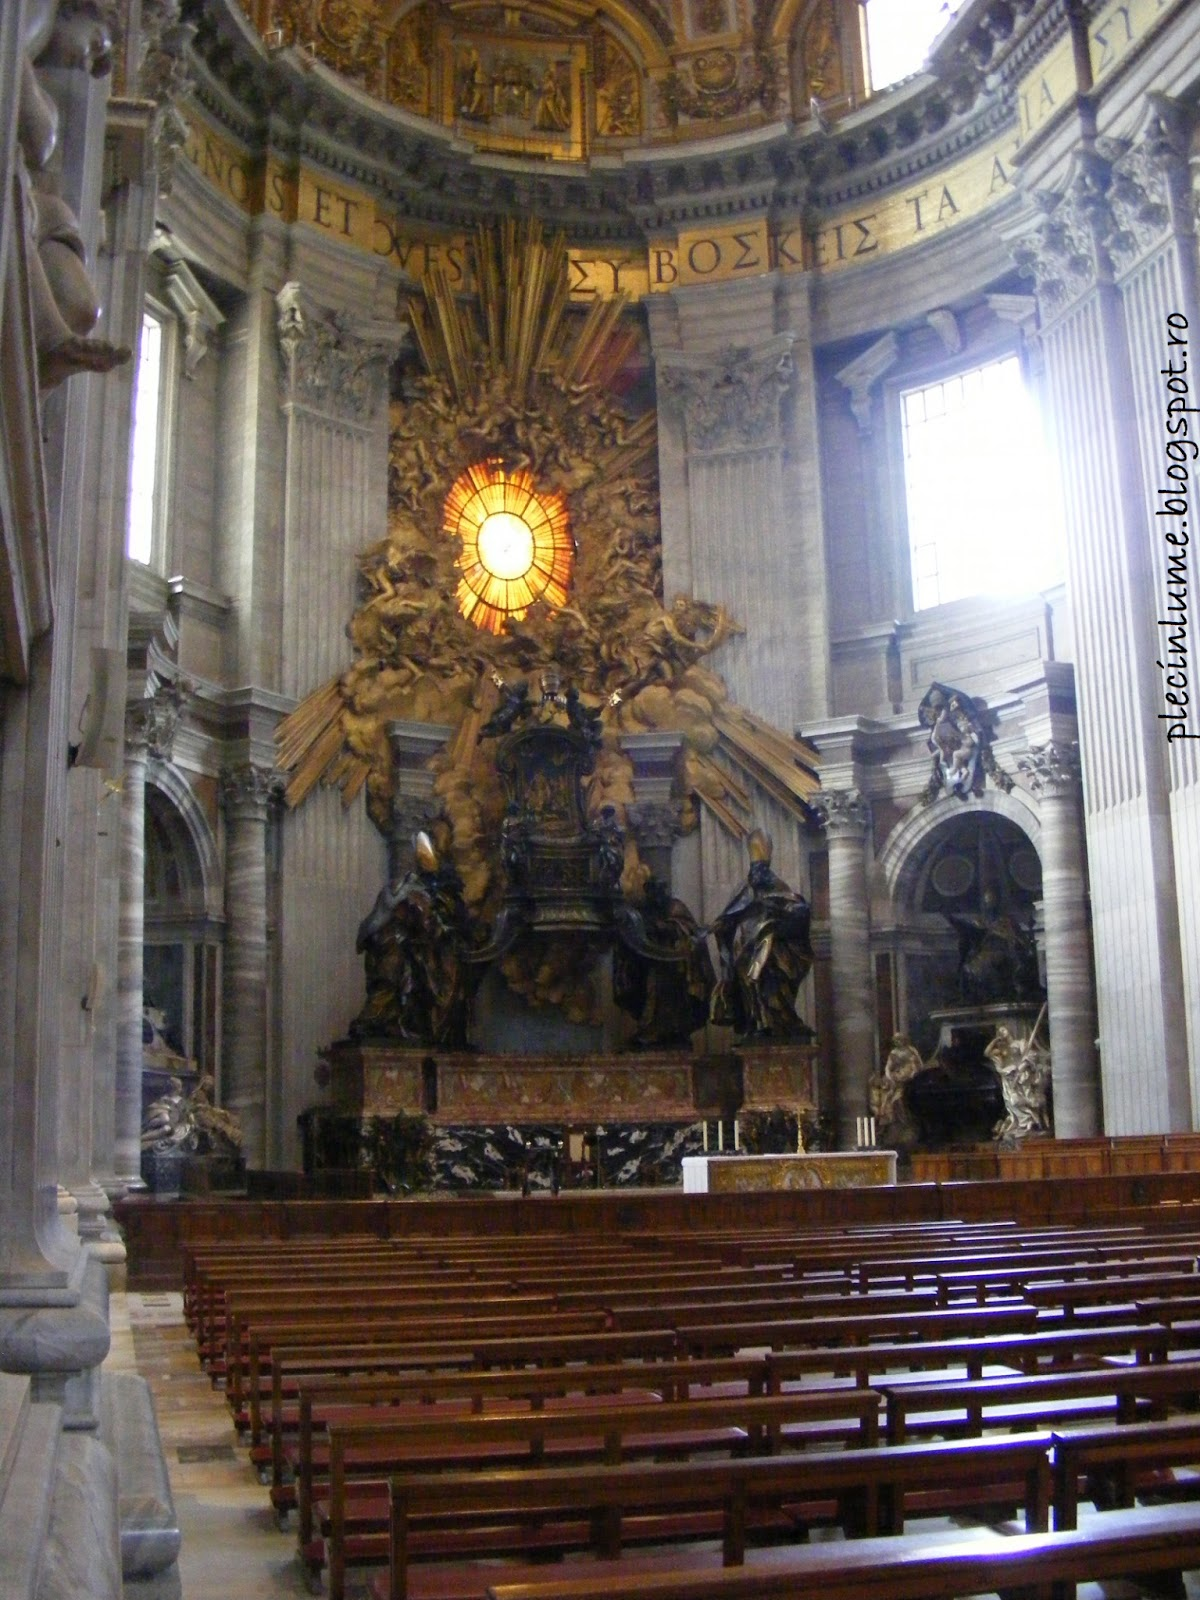 Catedrala San Pietro - interior